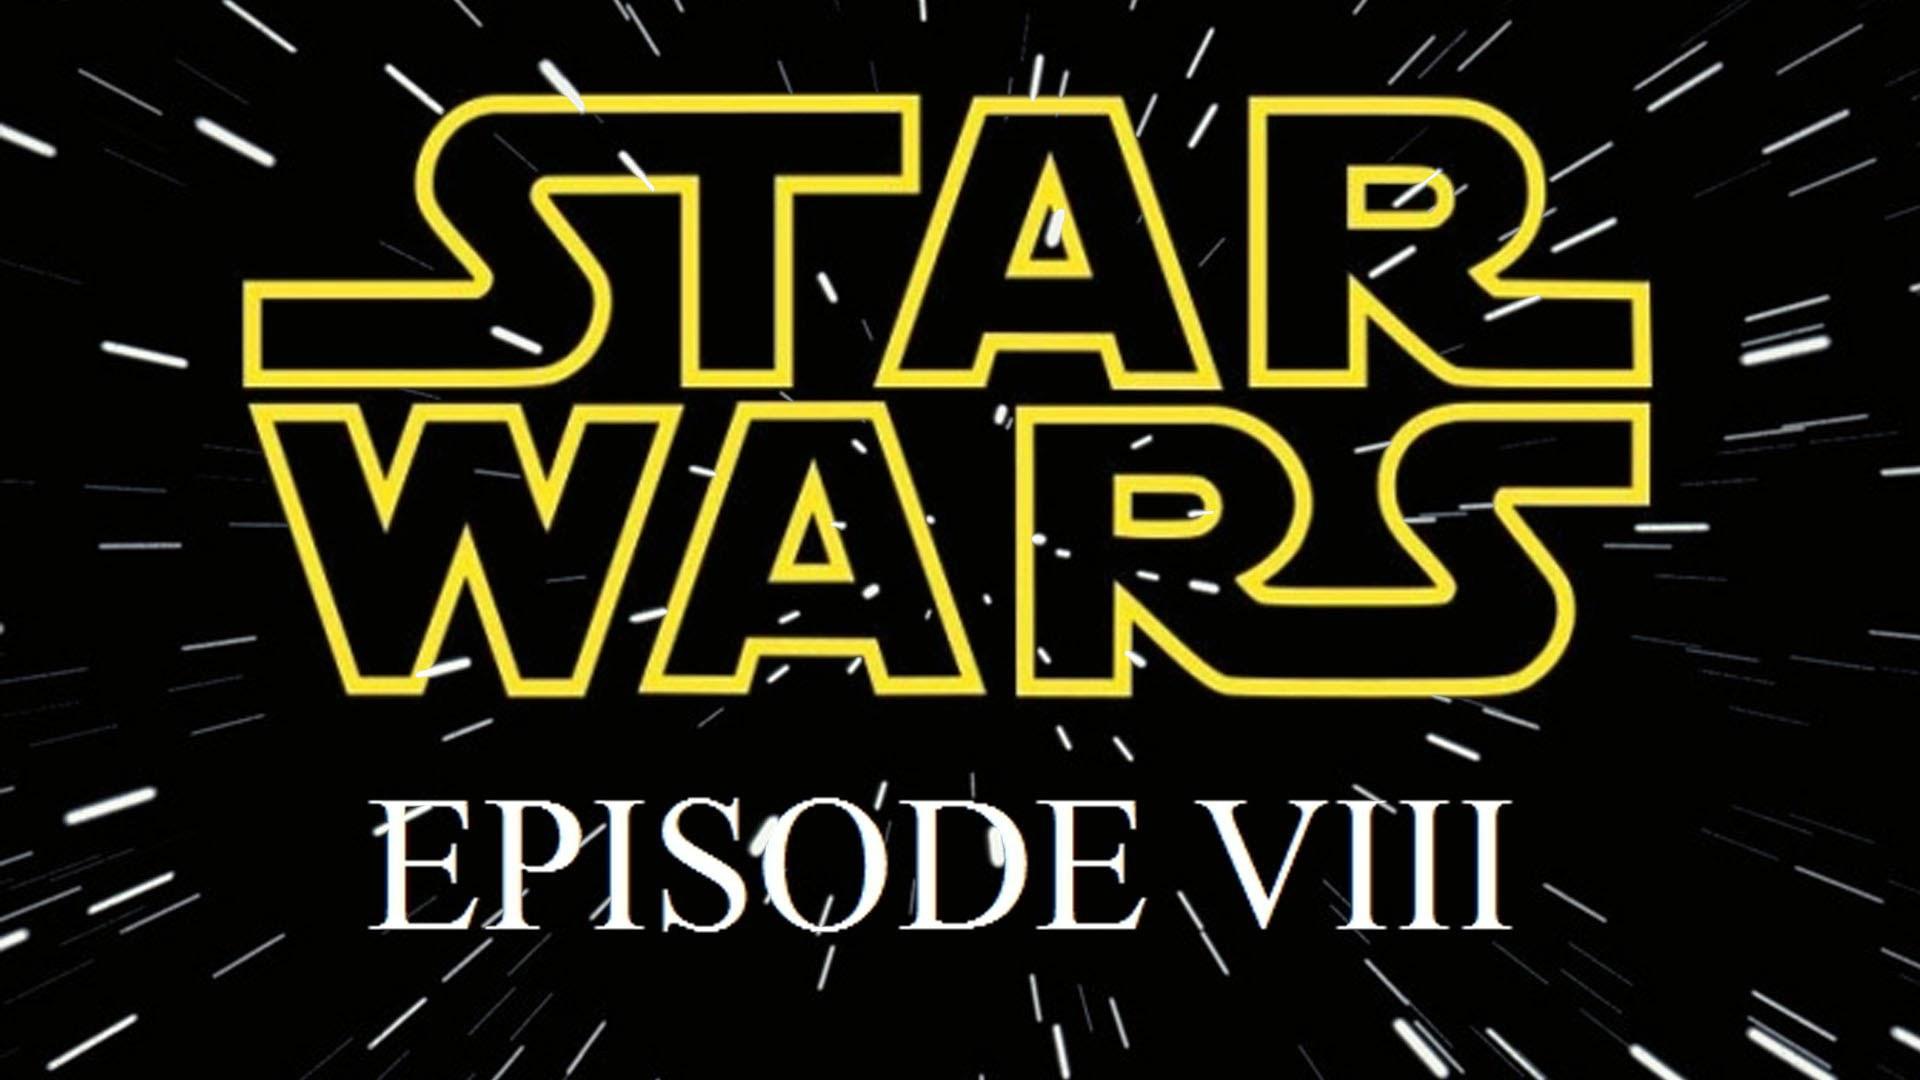 Star Wars Episode Viii Wallpapers Hd